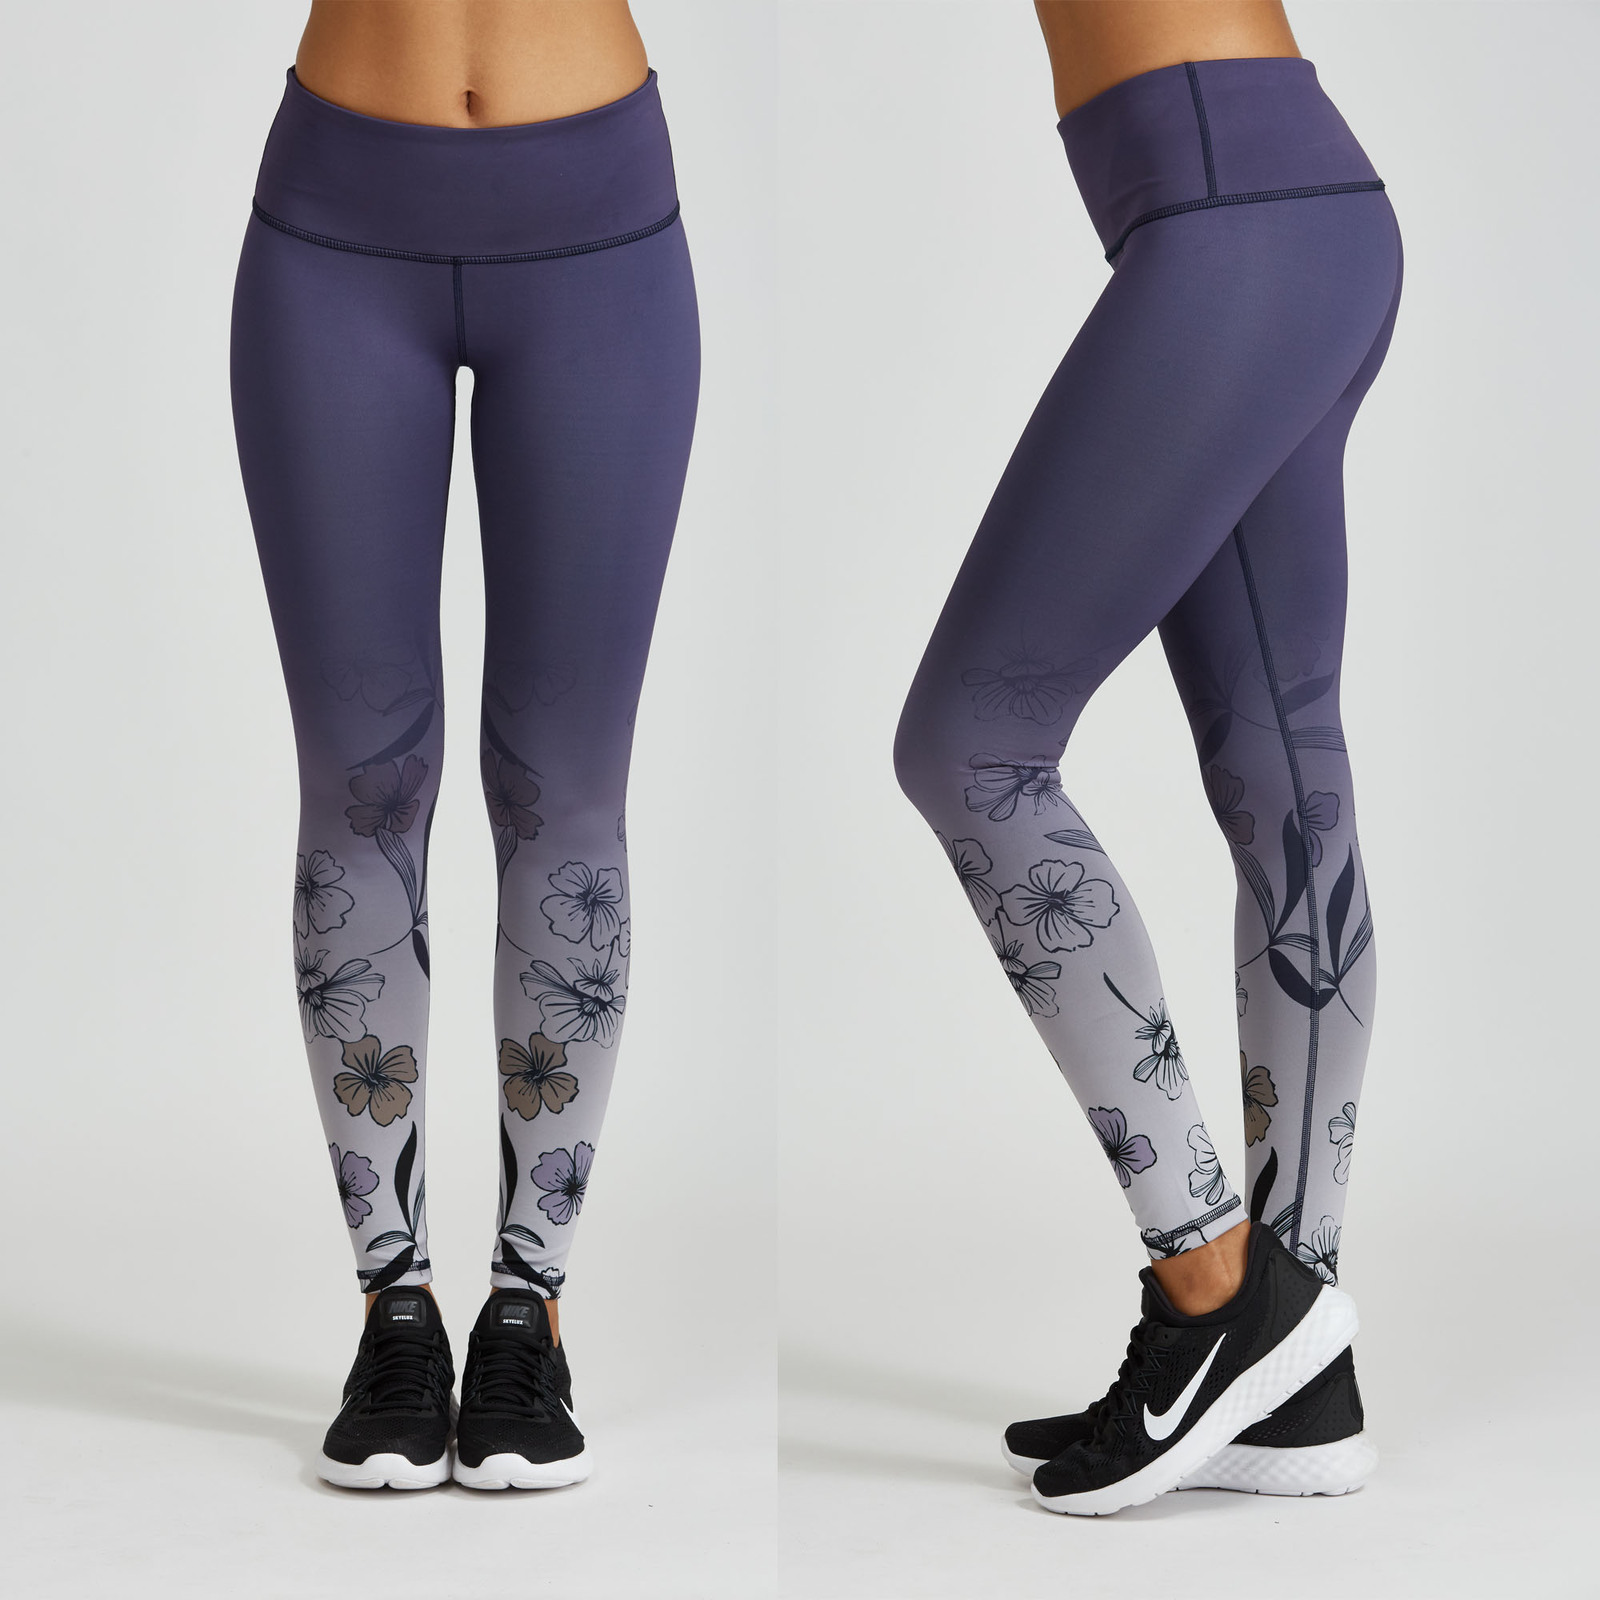 dc4f8577f859f Noli Yoga Women Performance Leggings, Wonderland- WM-ACT Activewear